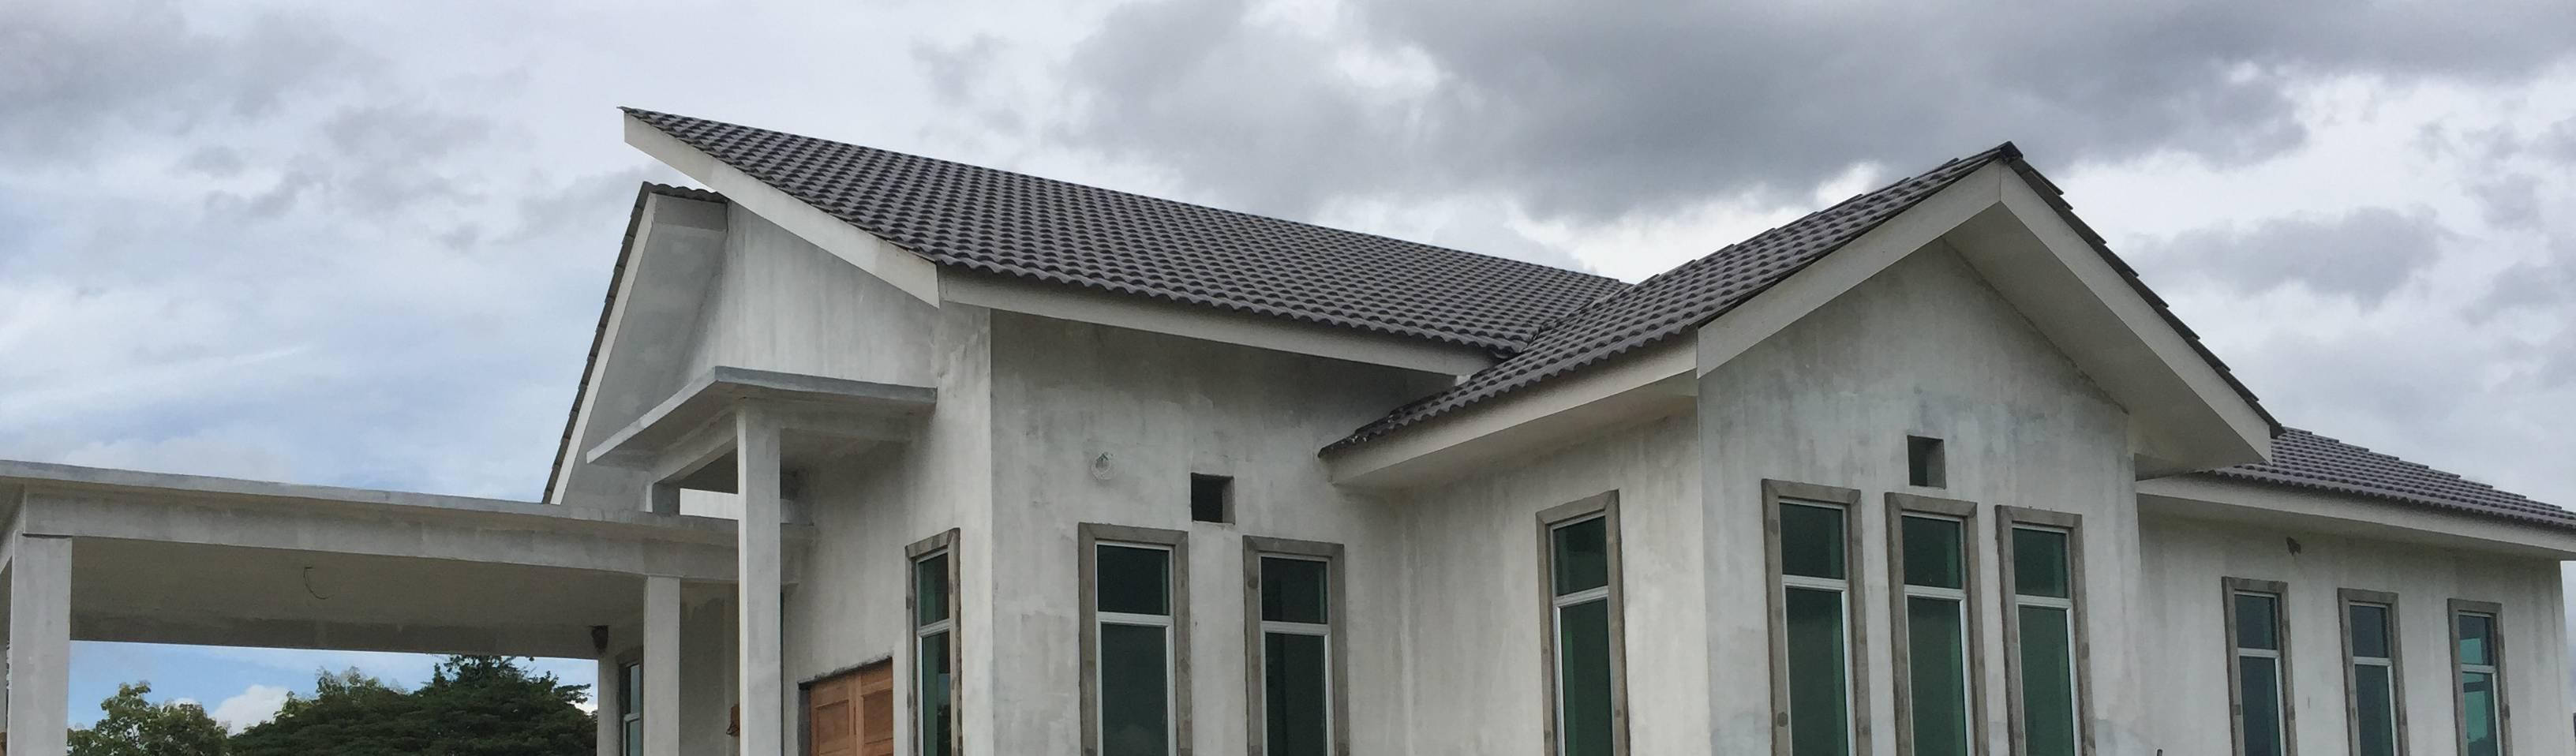 ARD Construction & Prefab House Services